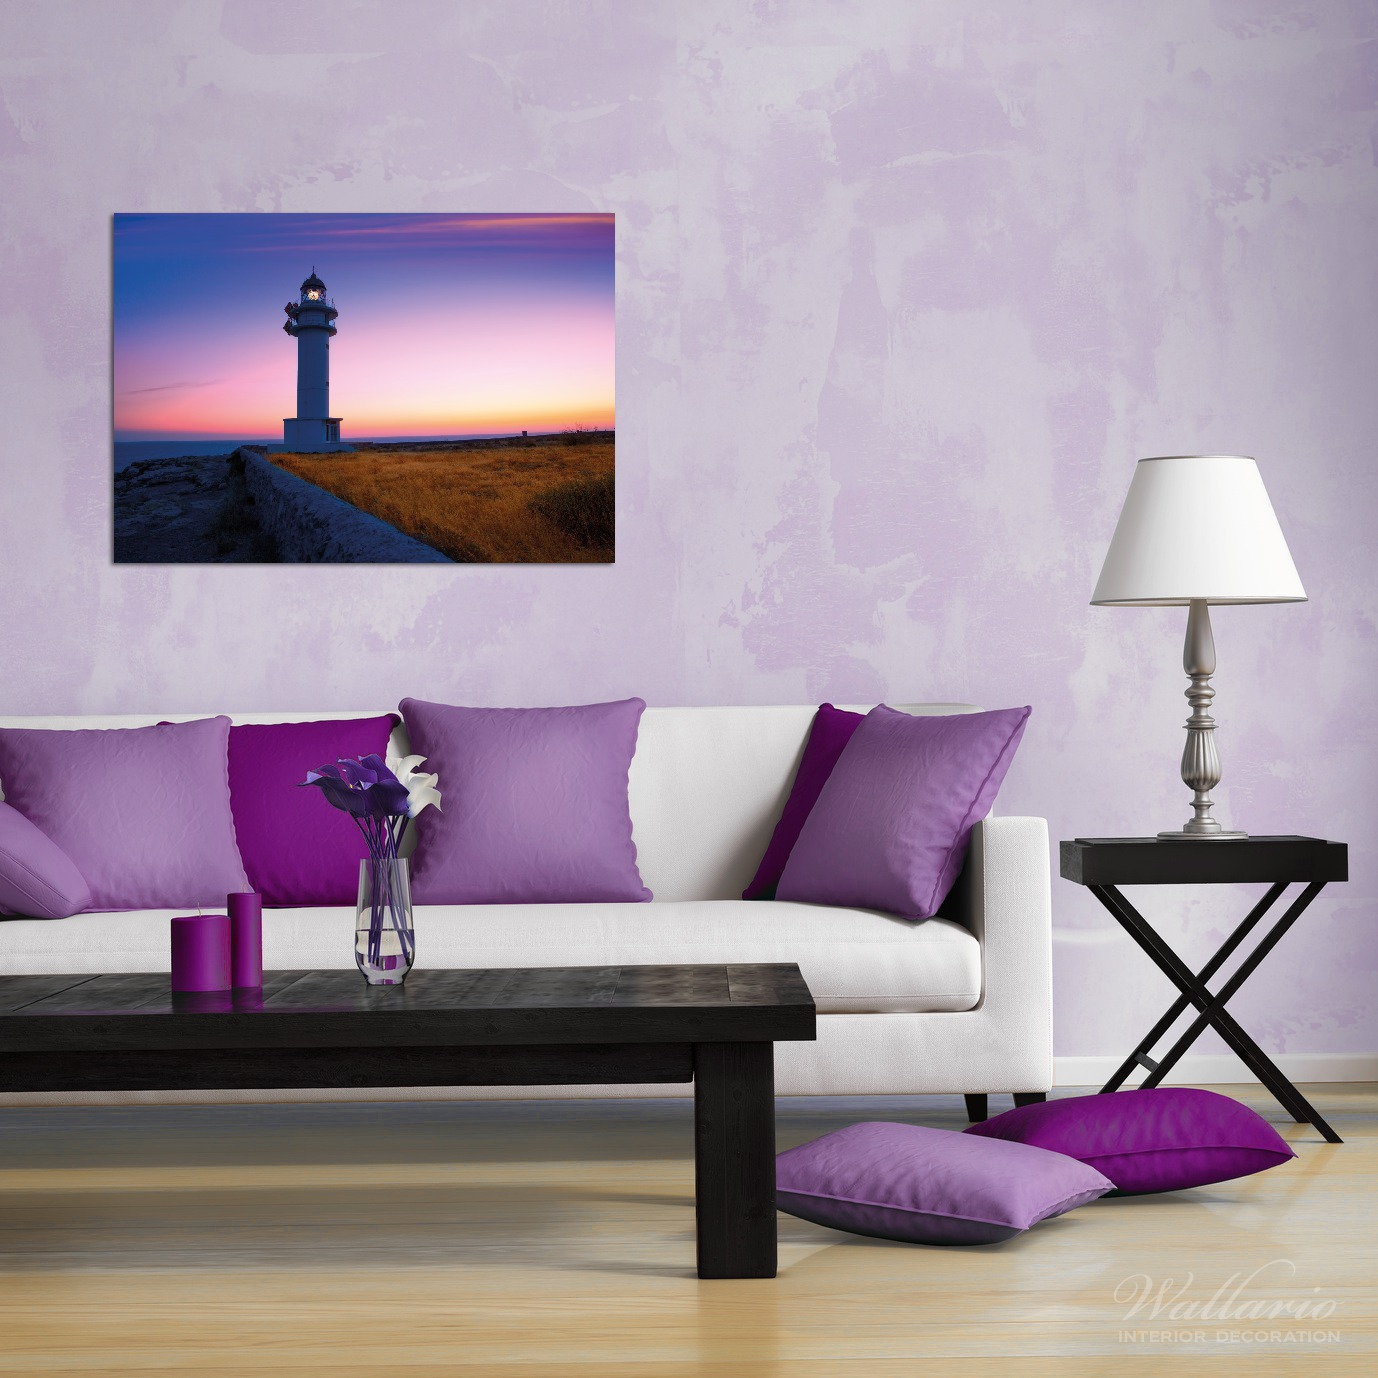 Wandbild Leuchtturm am Abend auf den Balearen – Malerischer Himmel – Bild 2